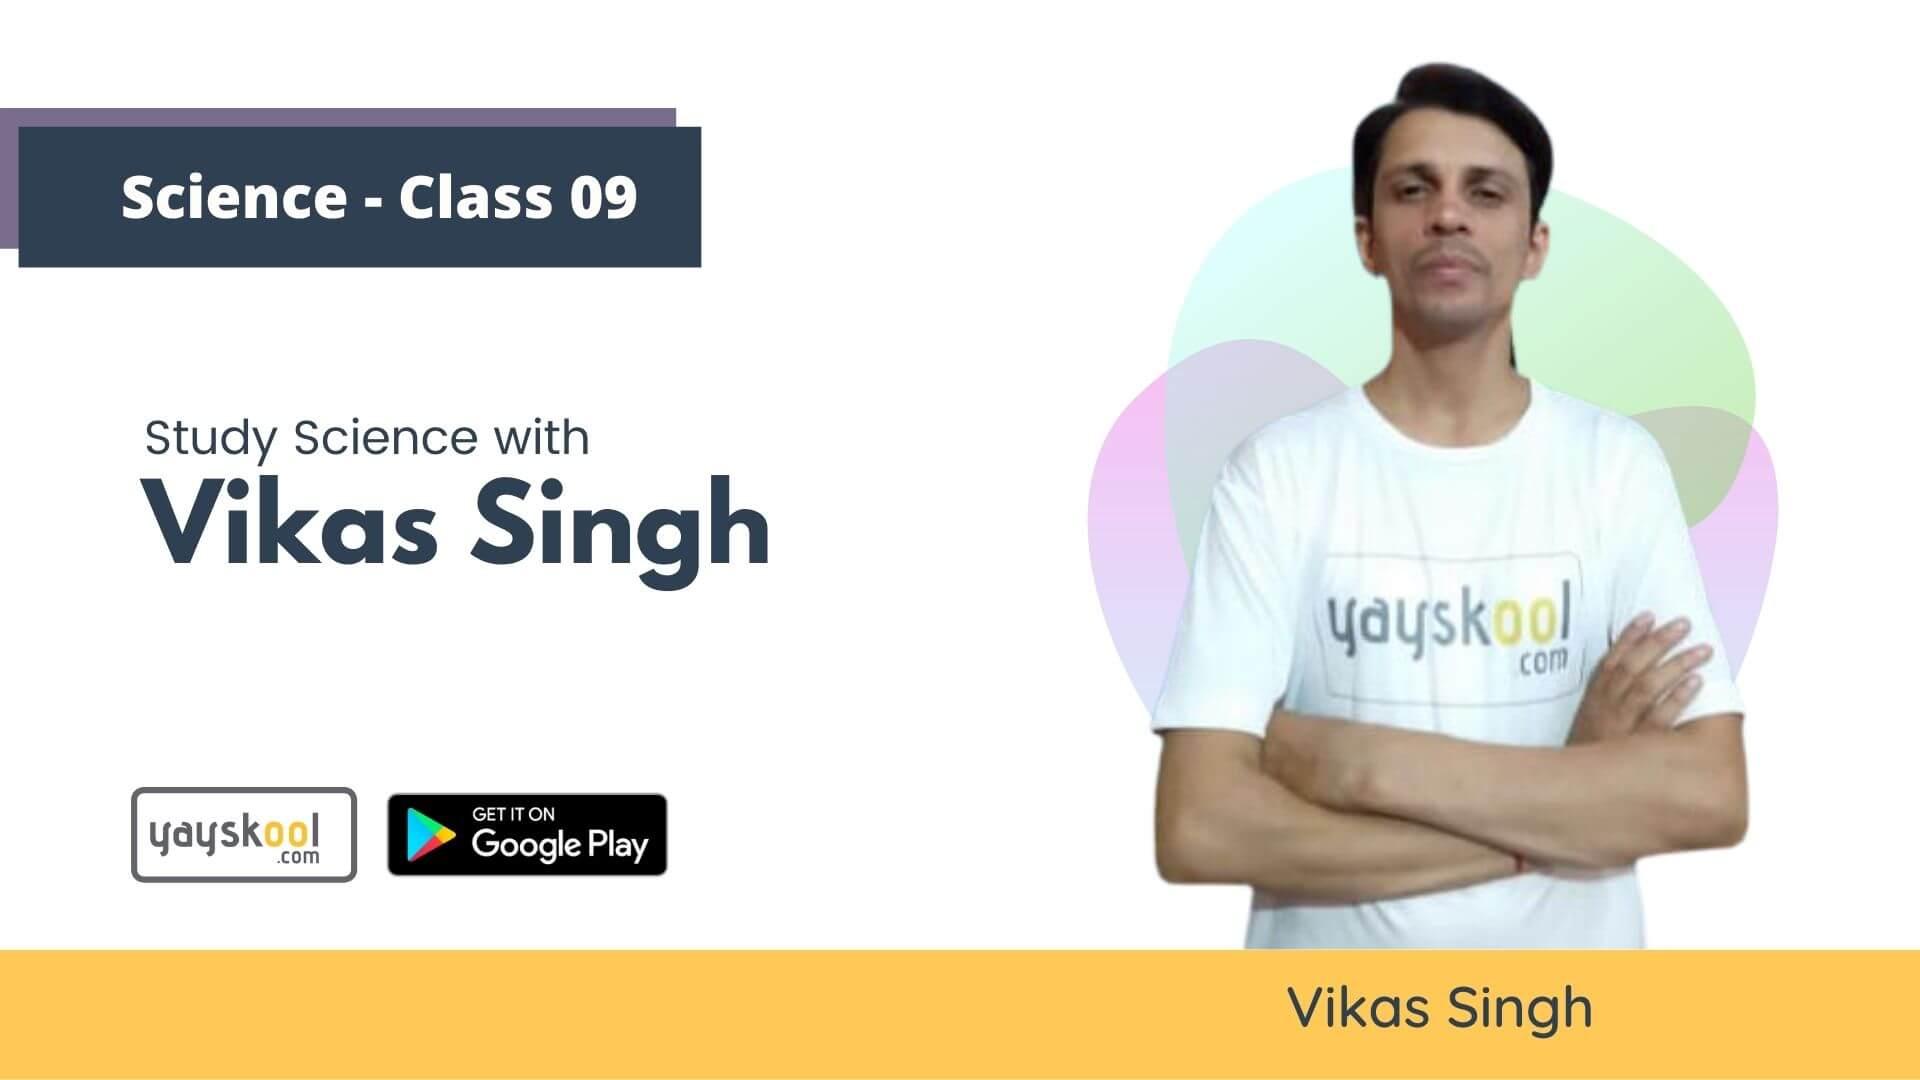 science-course-class09-vikas-singh